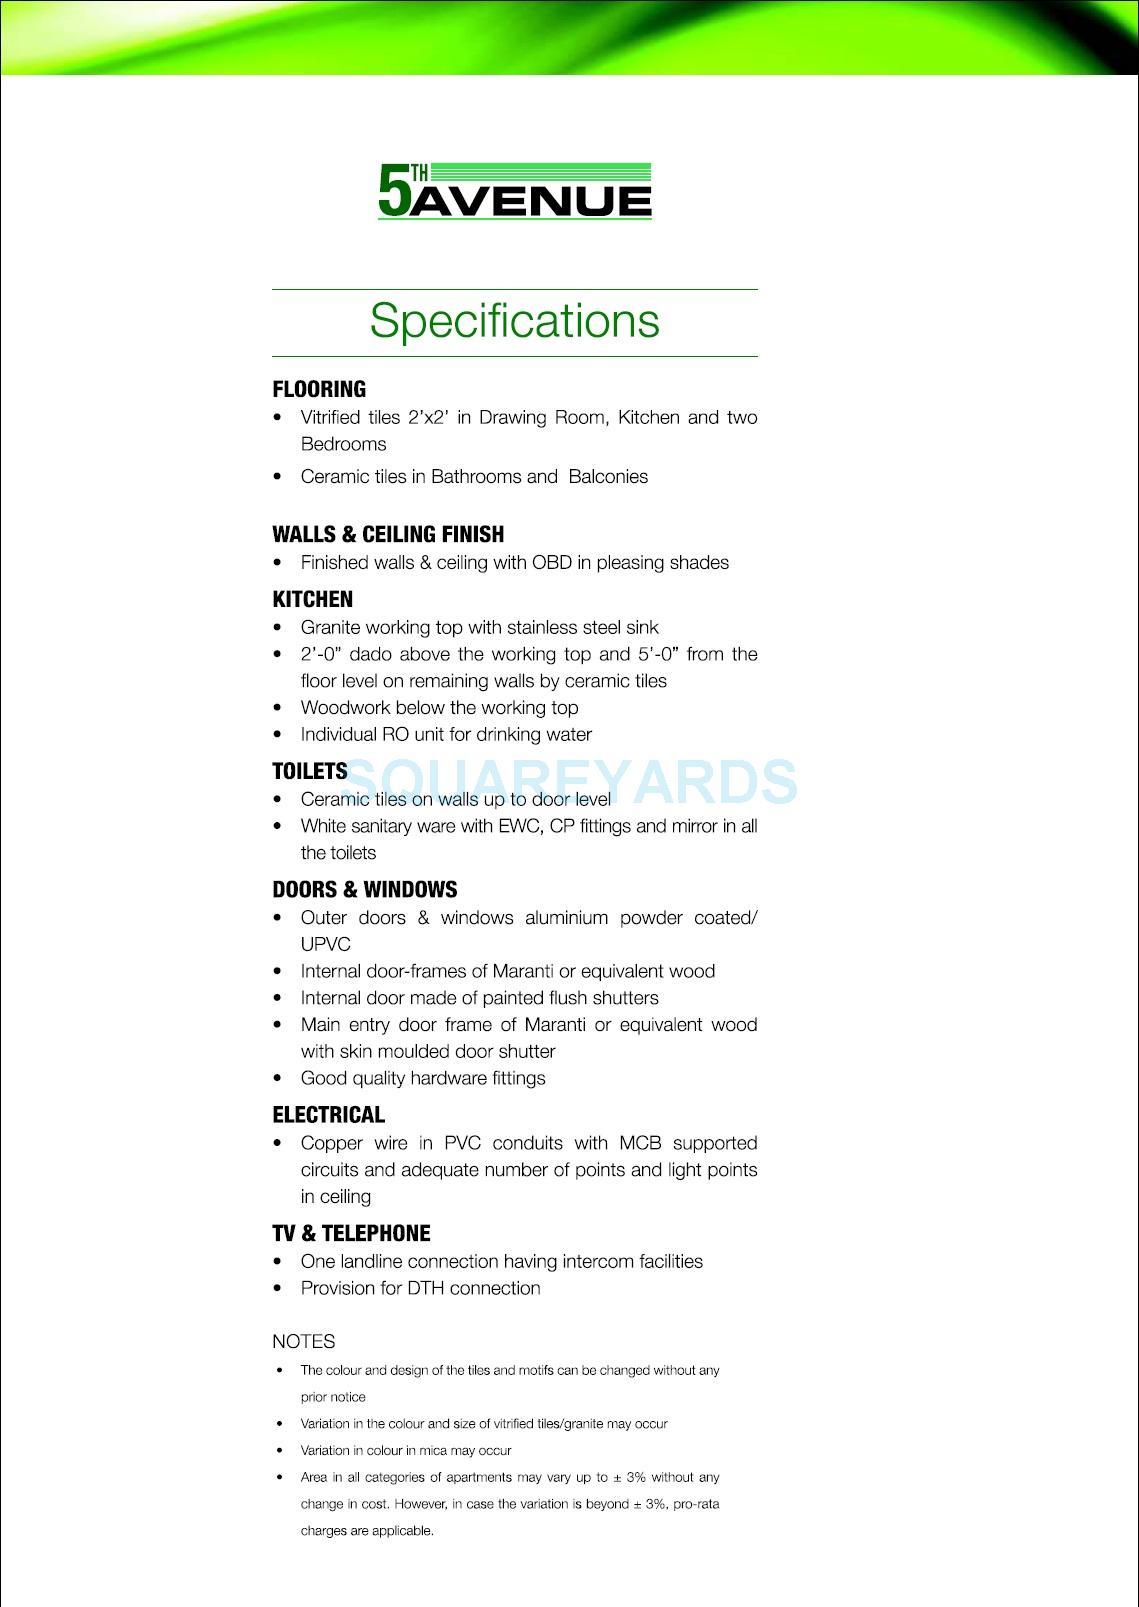 gaur city 5th avenue specification1